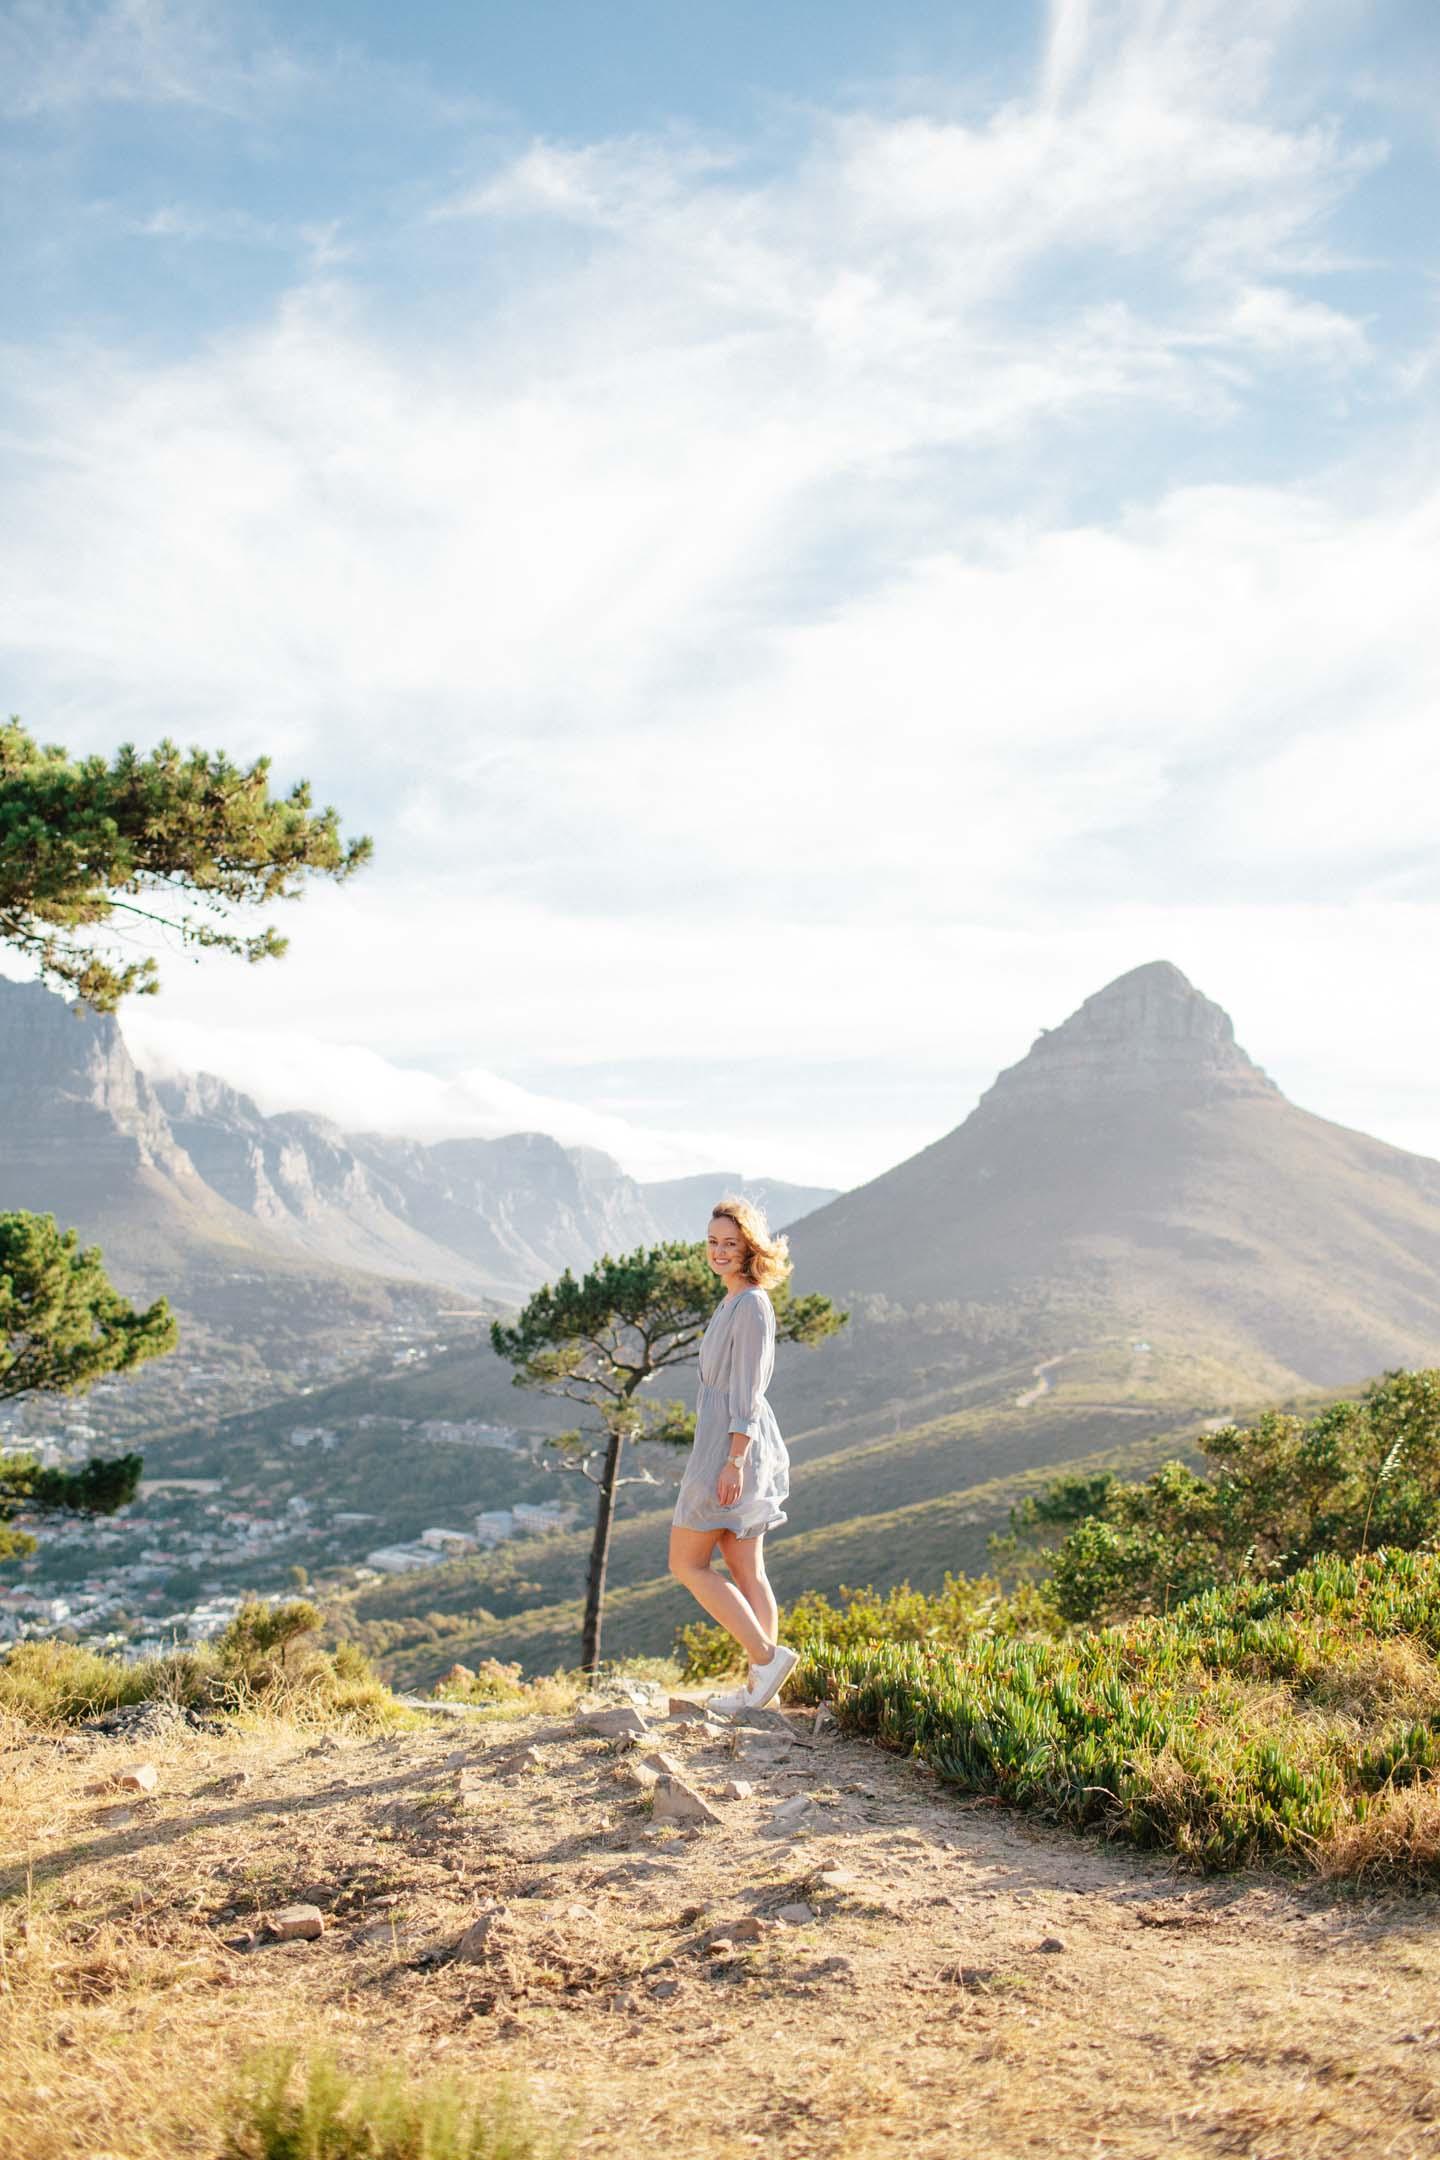 Vanessa_Esau_SouthAfrica_Capetown_Kapstadt_Travel (81)